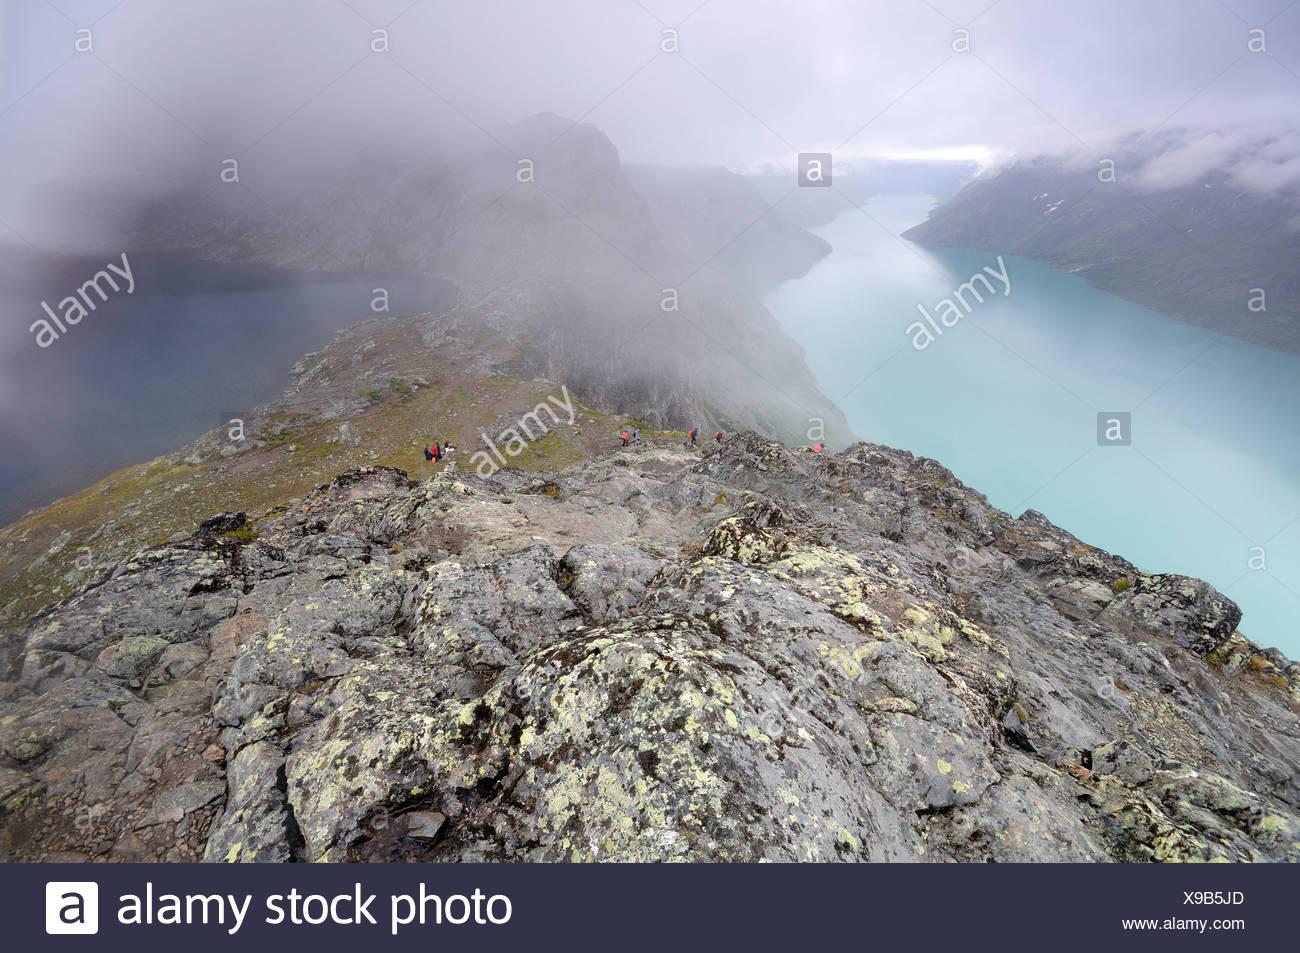 View over Lake Gjende from Besseggen ridge, Jotunheimen National Park, Norway, Scandinavia, Europe - Stock Image